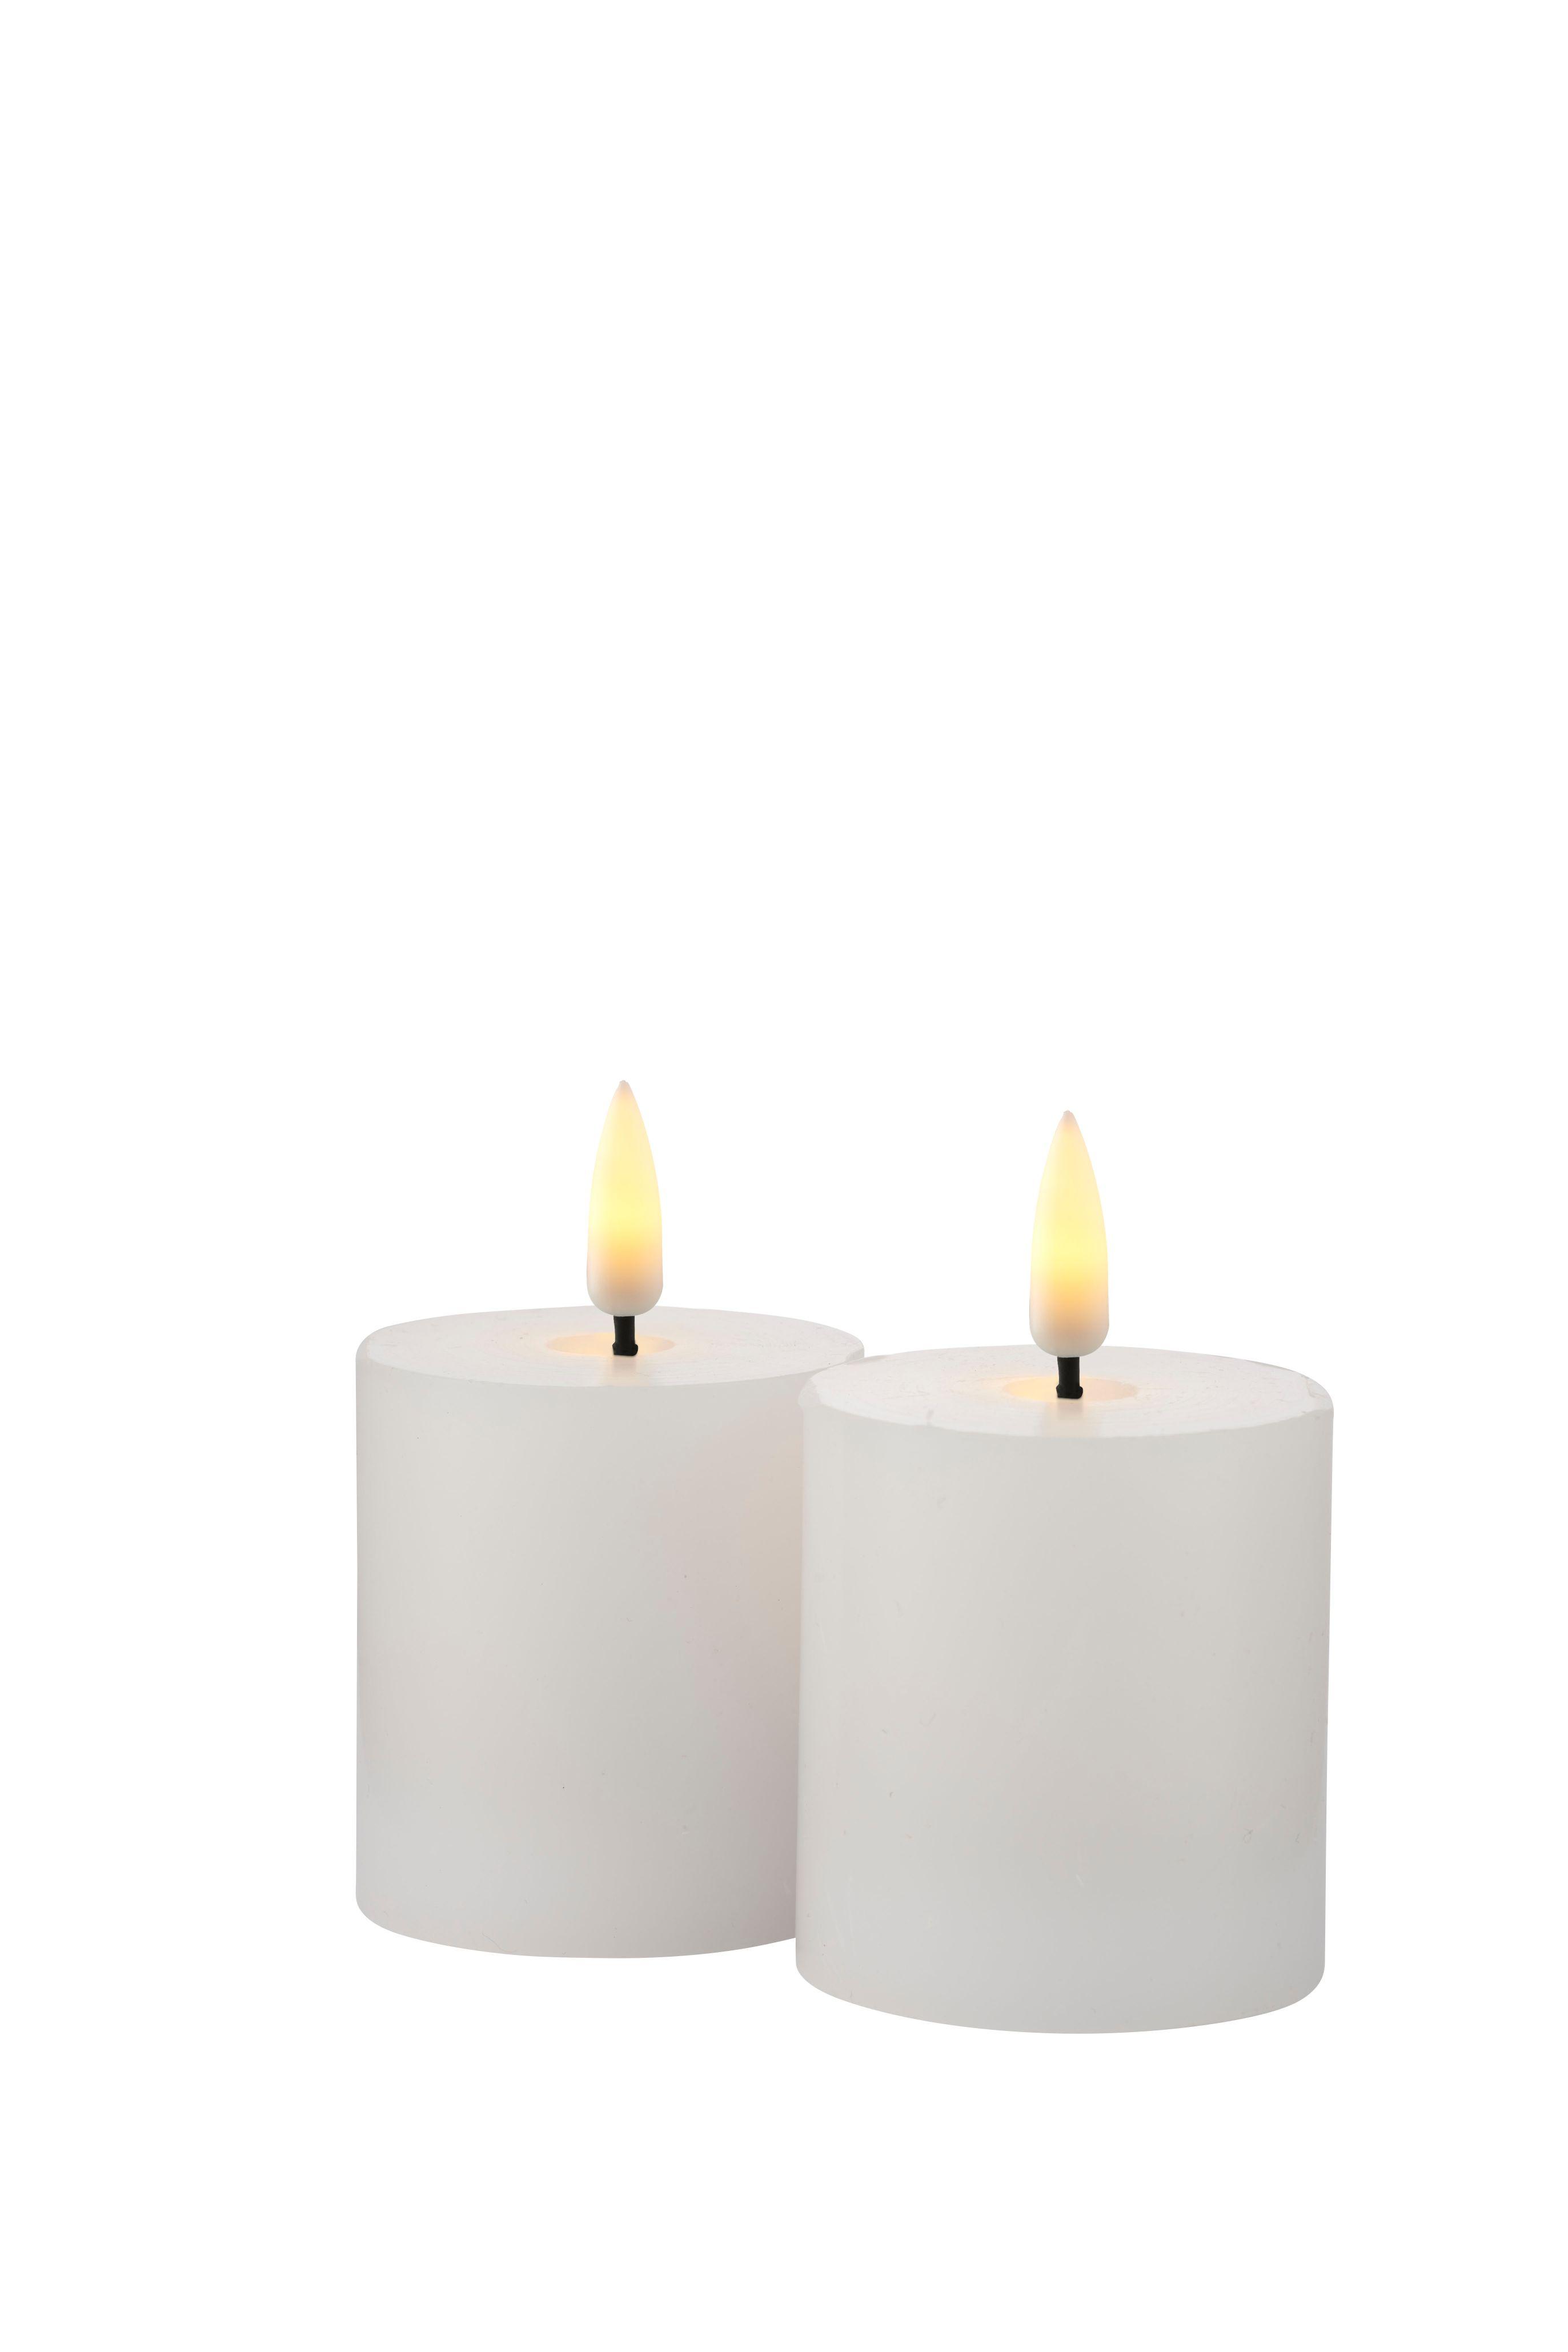 Sirius Mini Sille lys, hvid, 2 stk